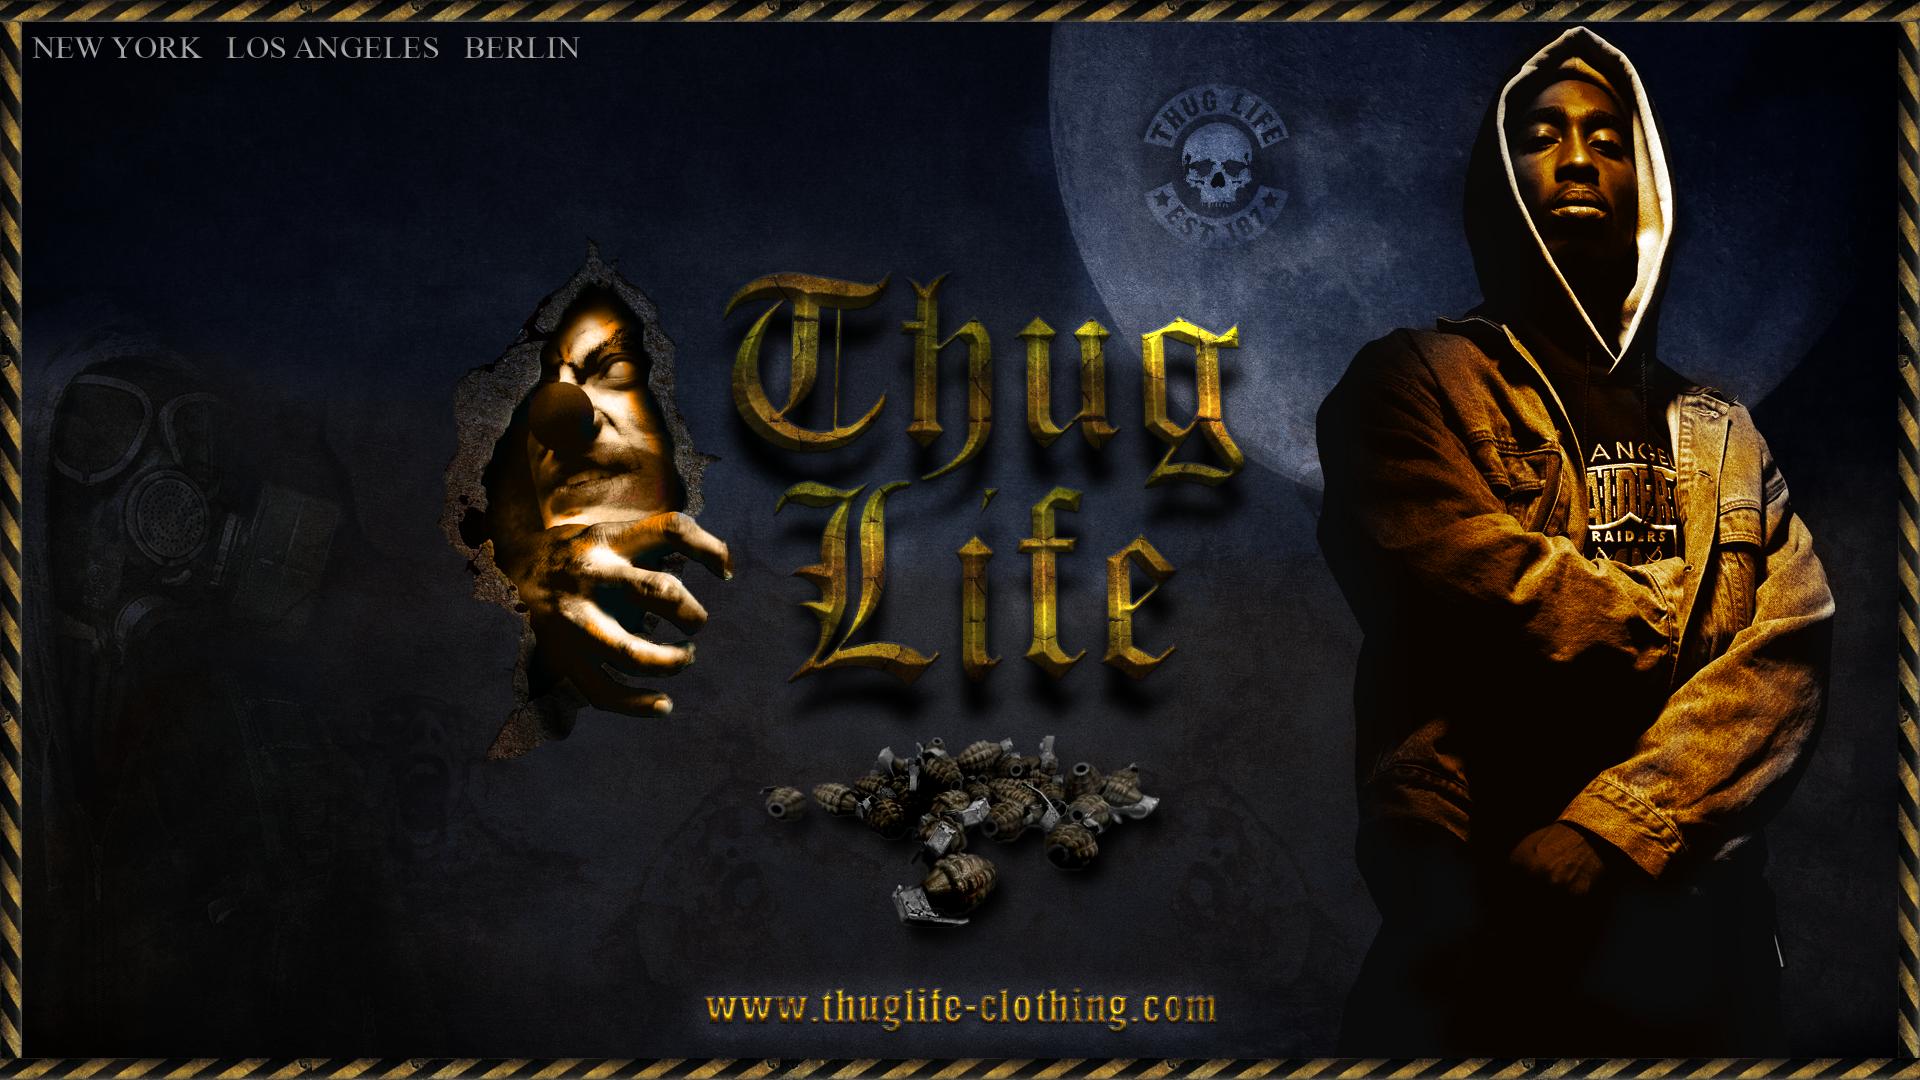 Thug wallpaper wallpapersafari - Thug life wallpaper ...